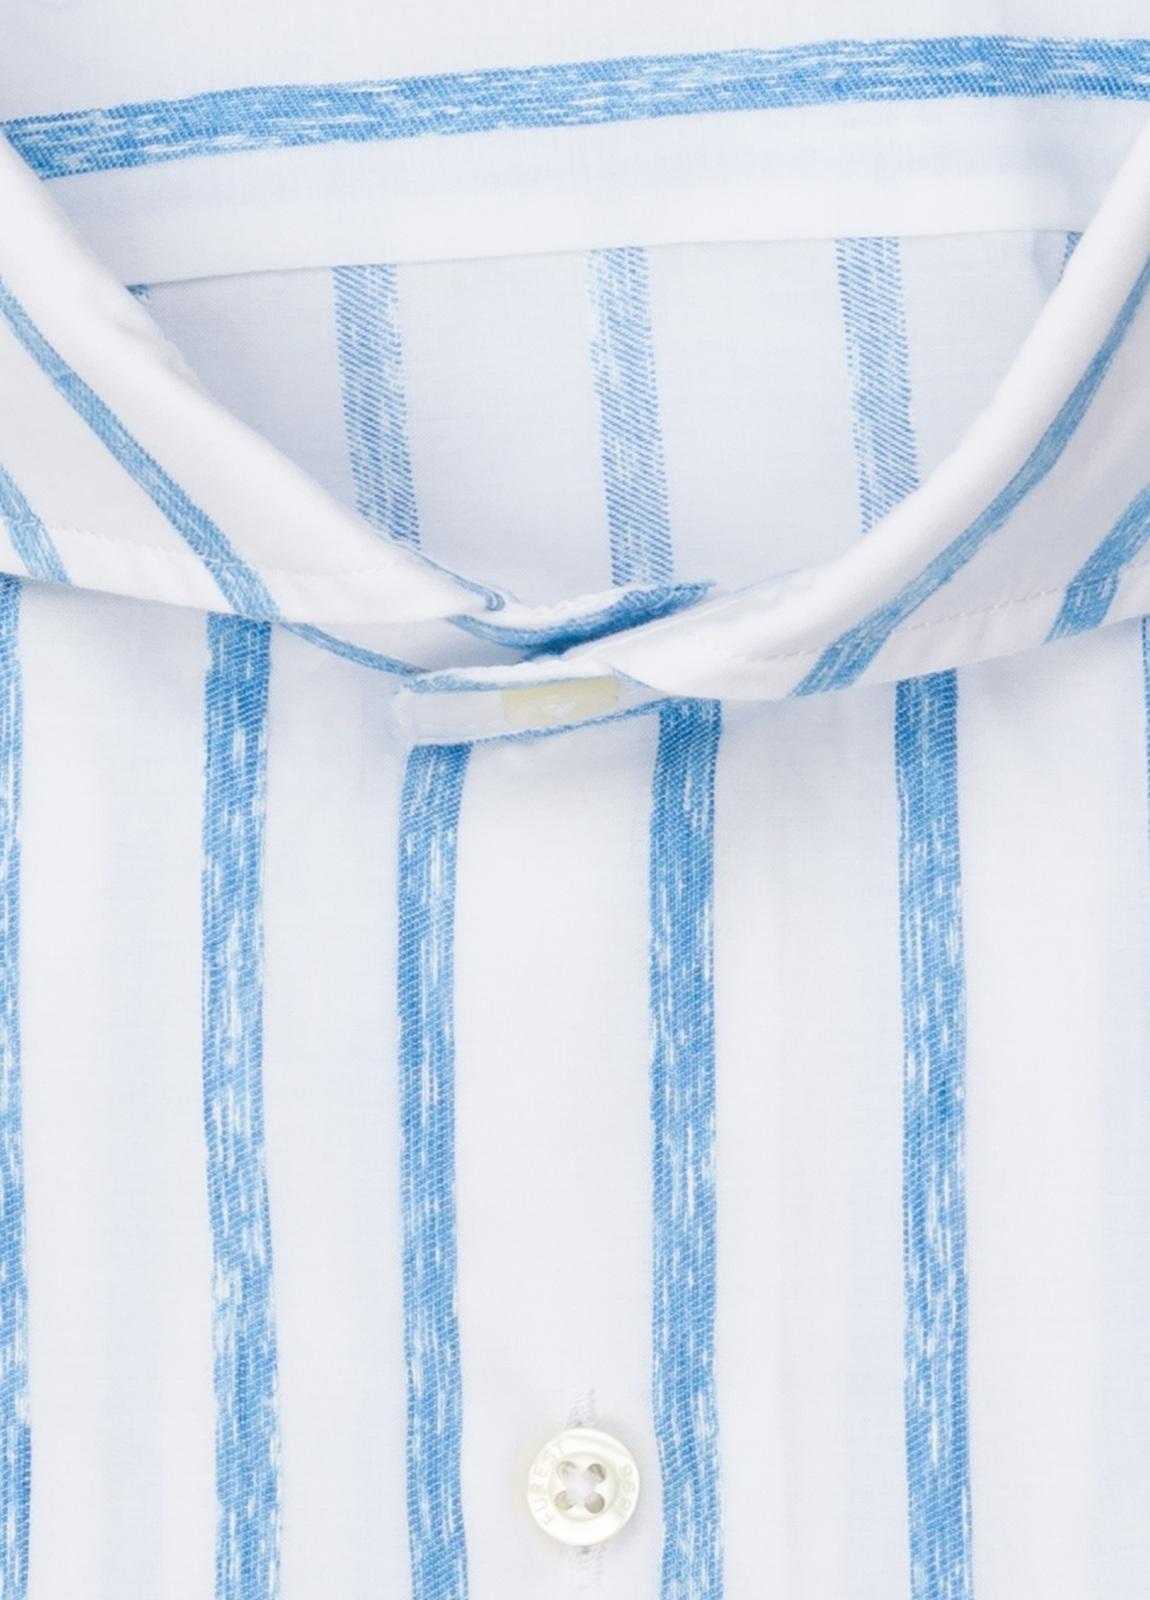 Camisa sport FUREST COLECCIÓN SLIM FIT rayas azul - Ítem1